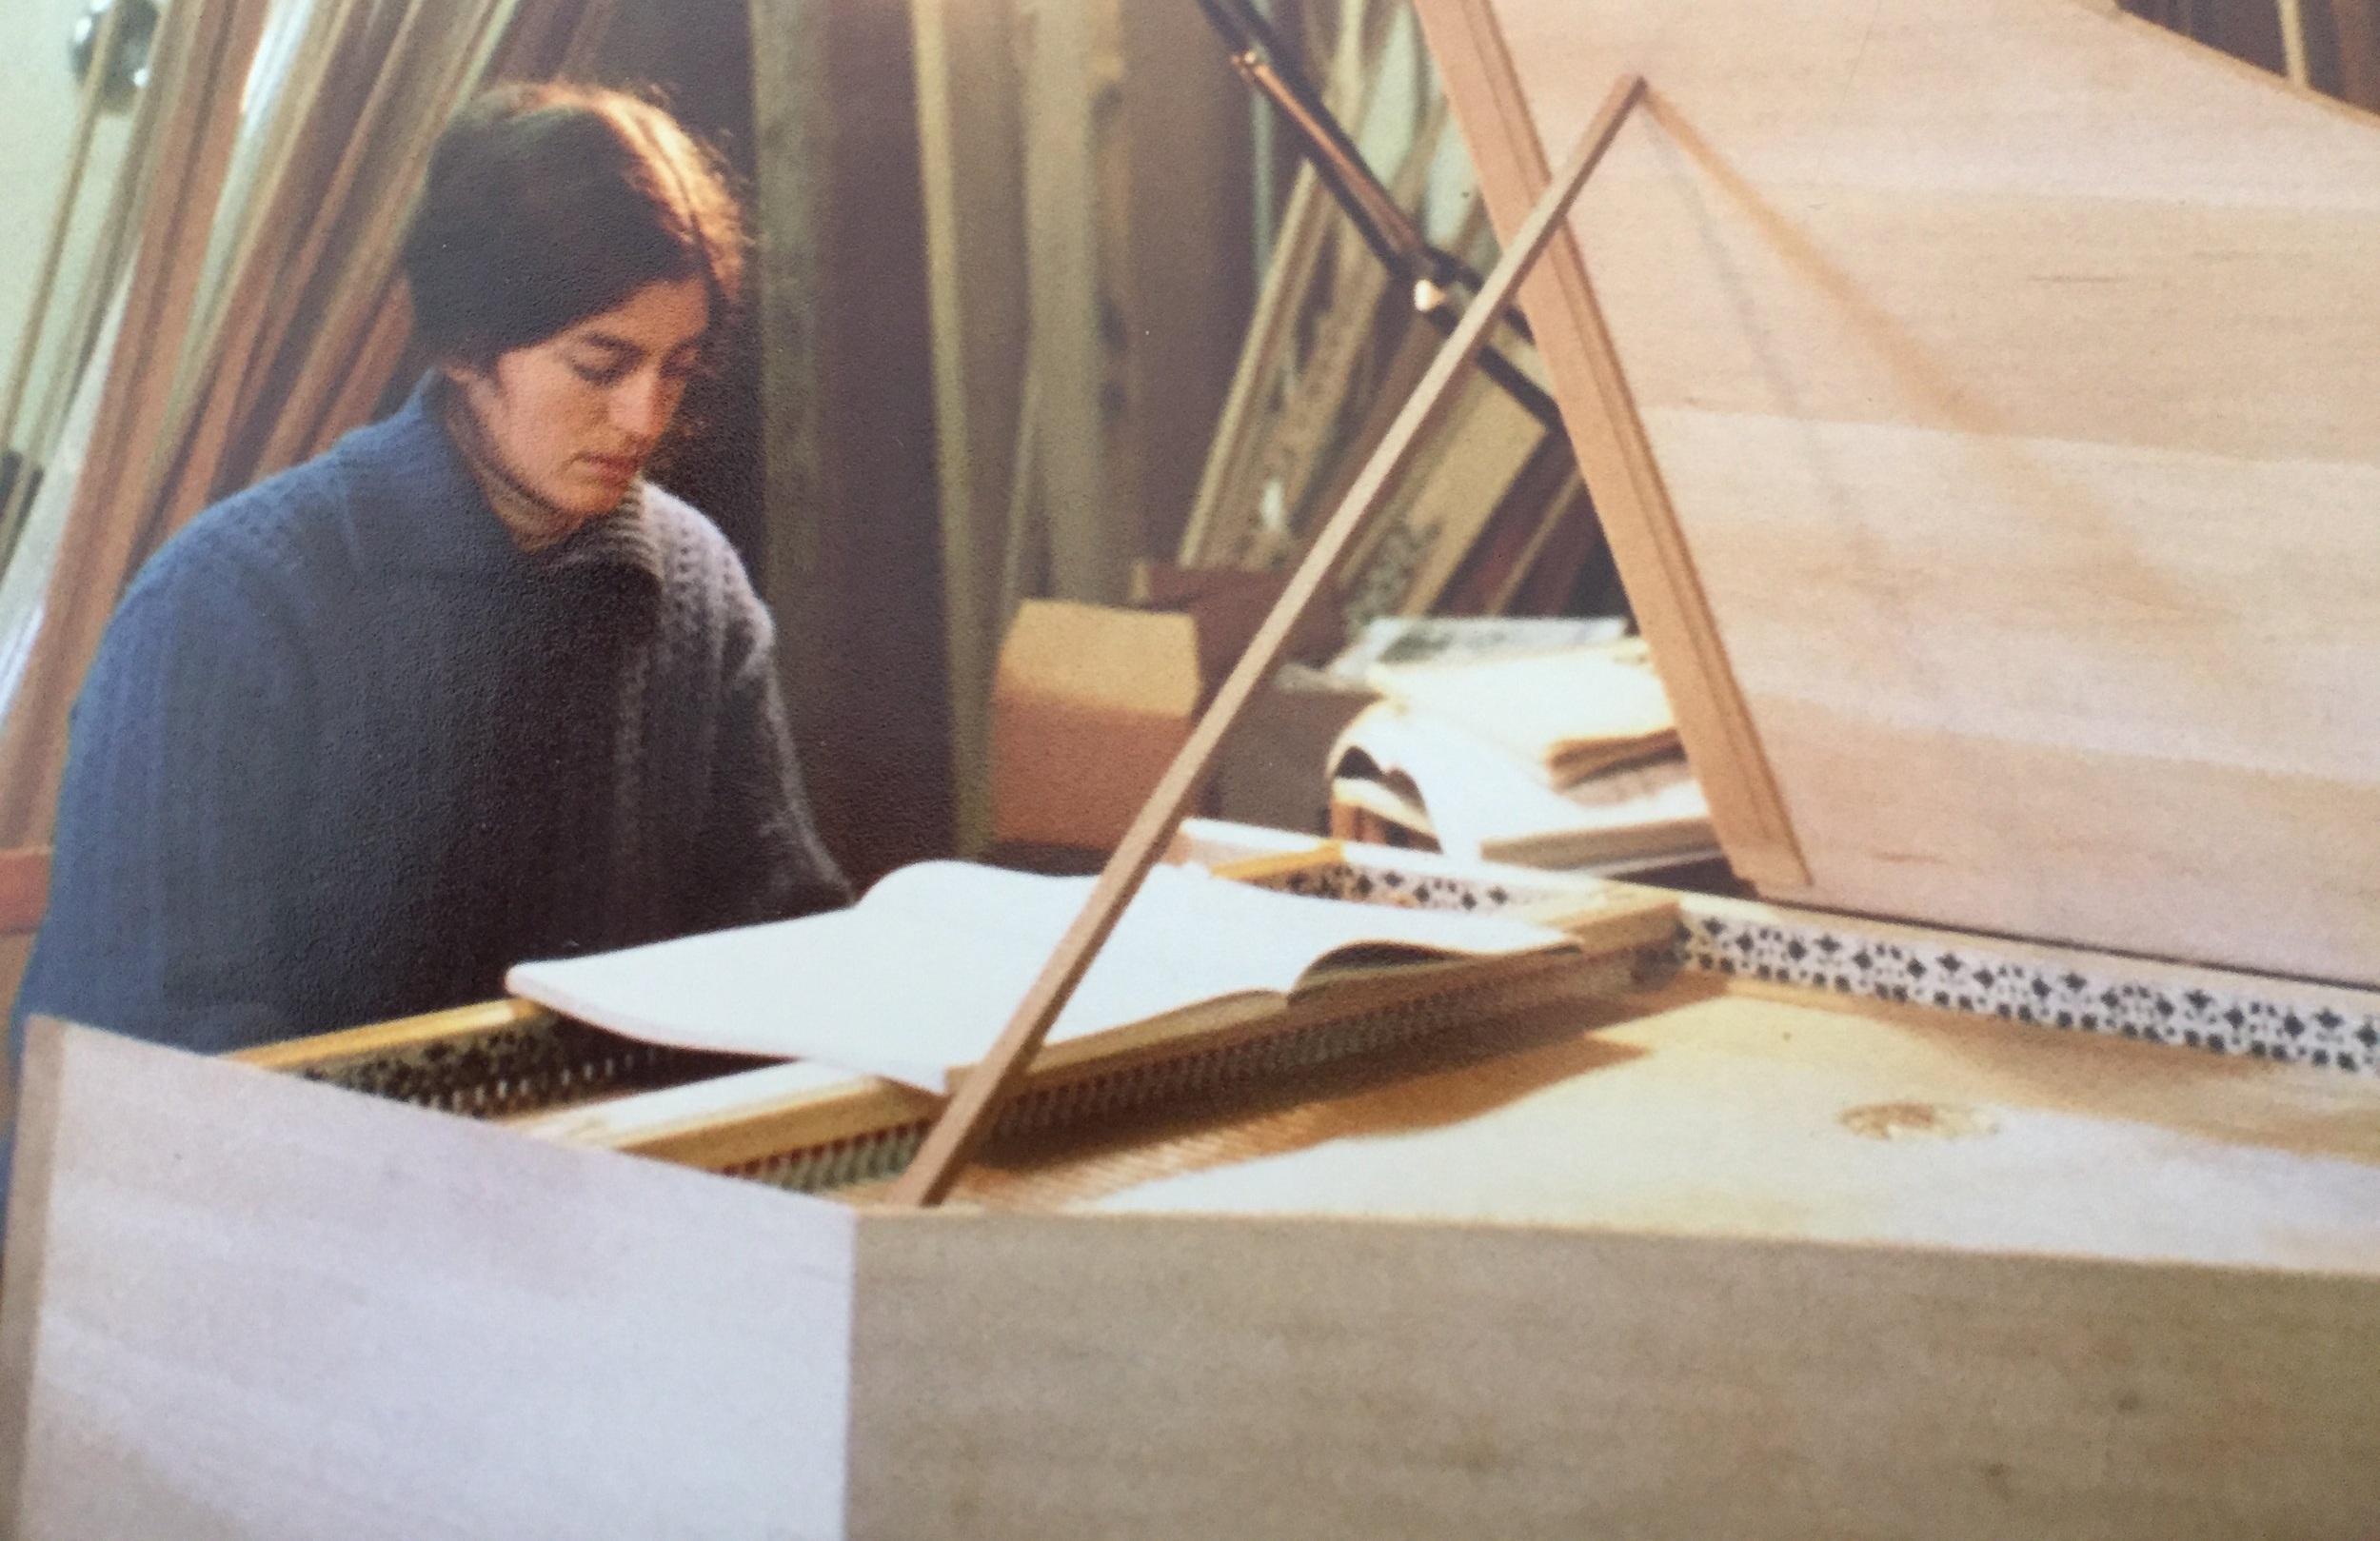 Elaine+at+the+Harpsichord.jpg